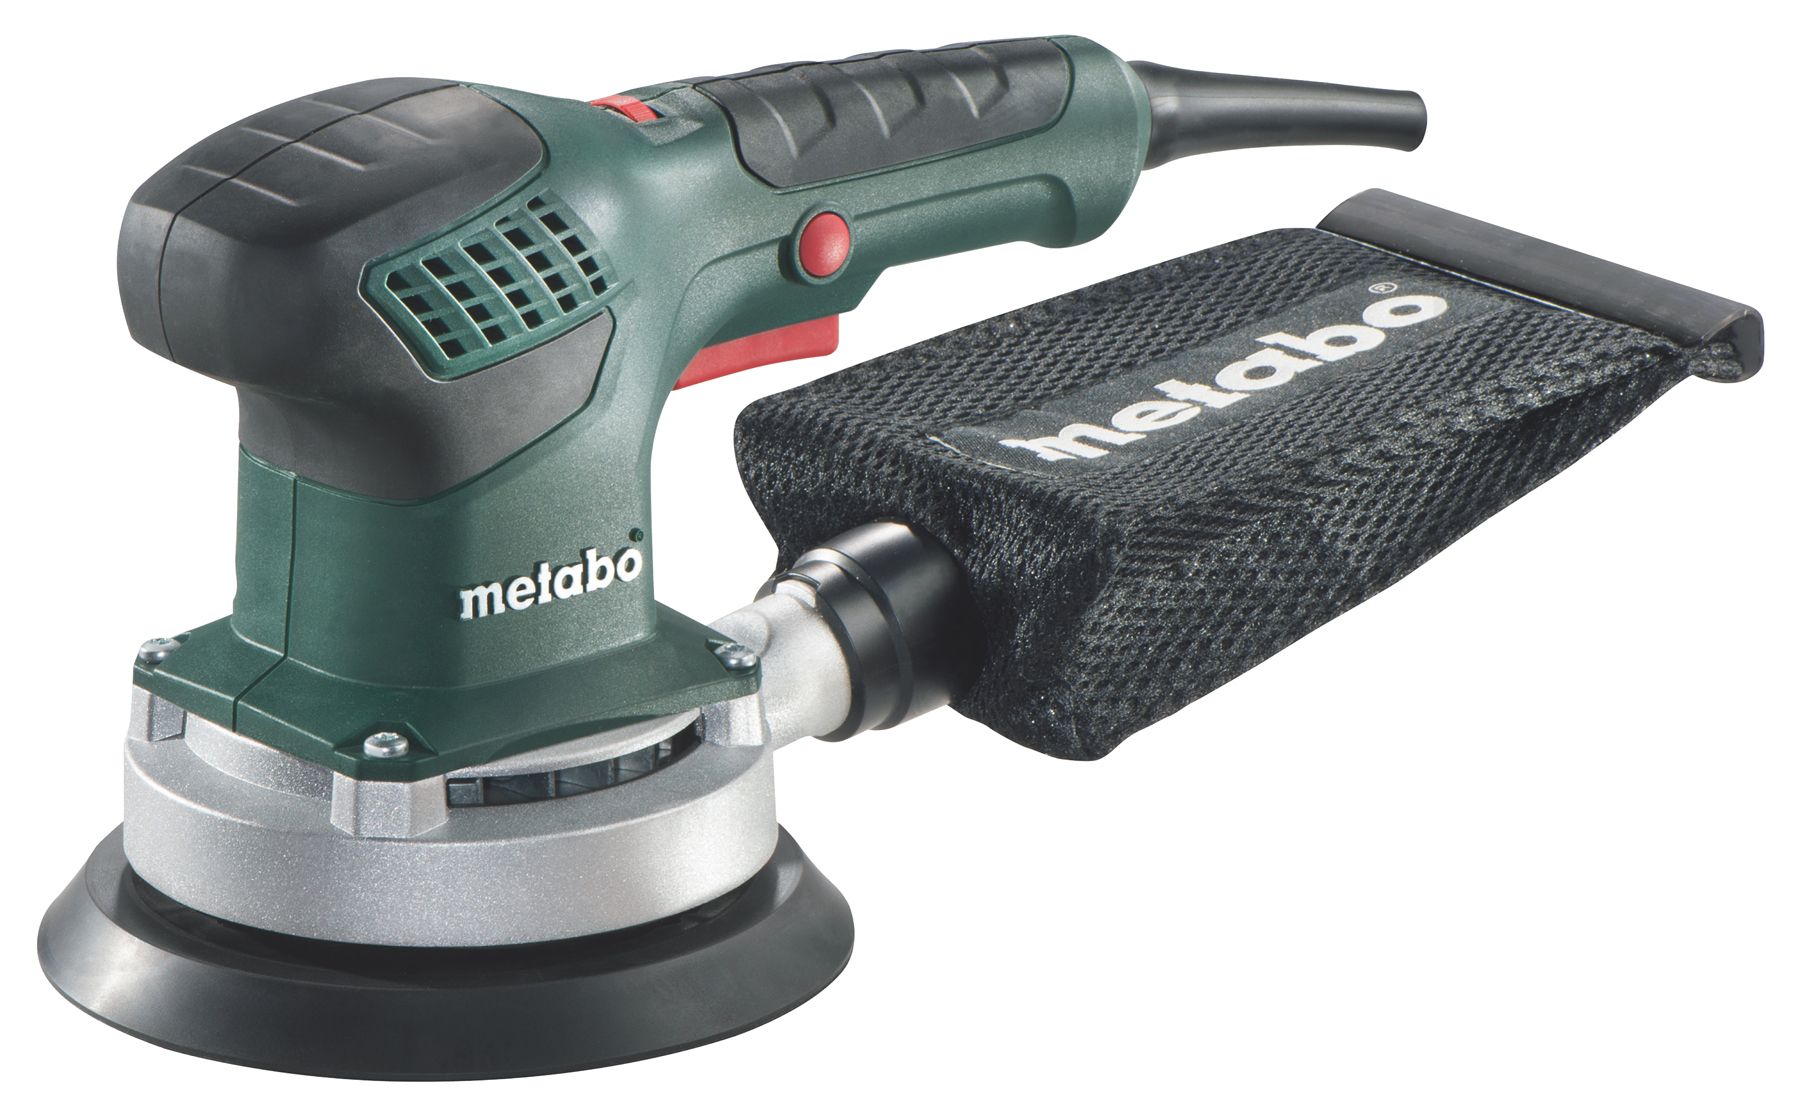 Metabo SXE 3150 (600444500) - эксцентриковая шлифмашина + кейс (Green)